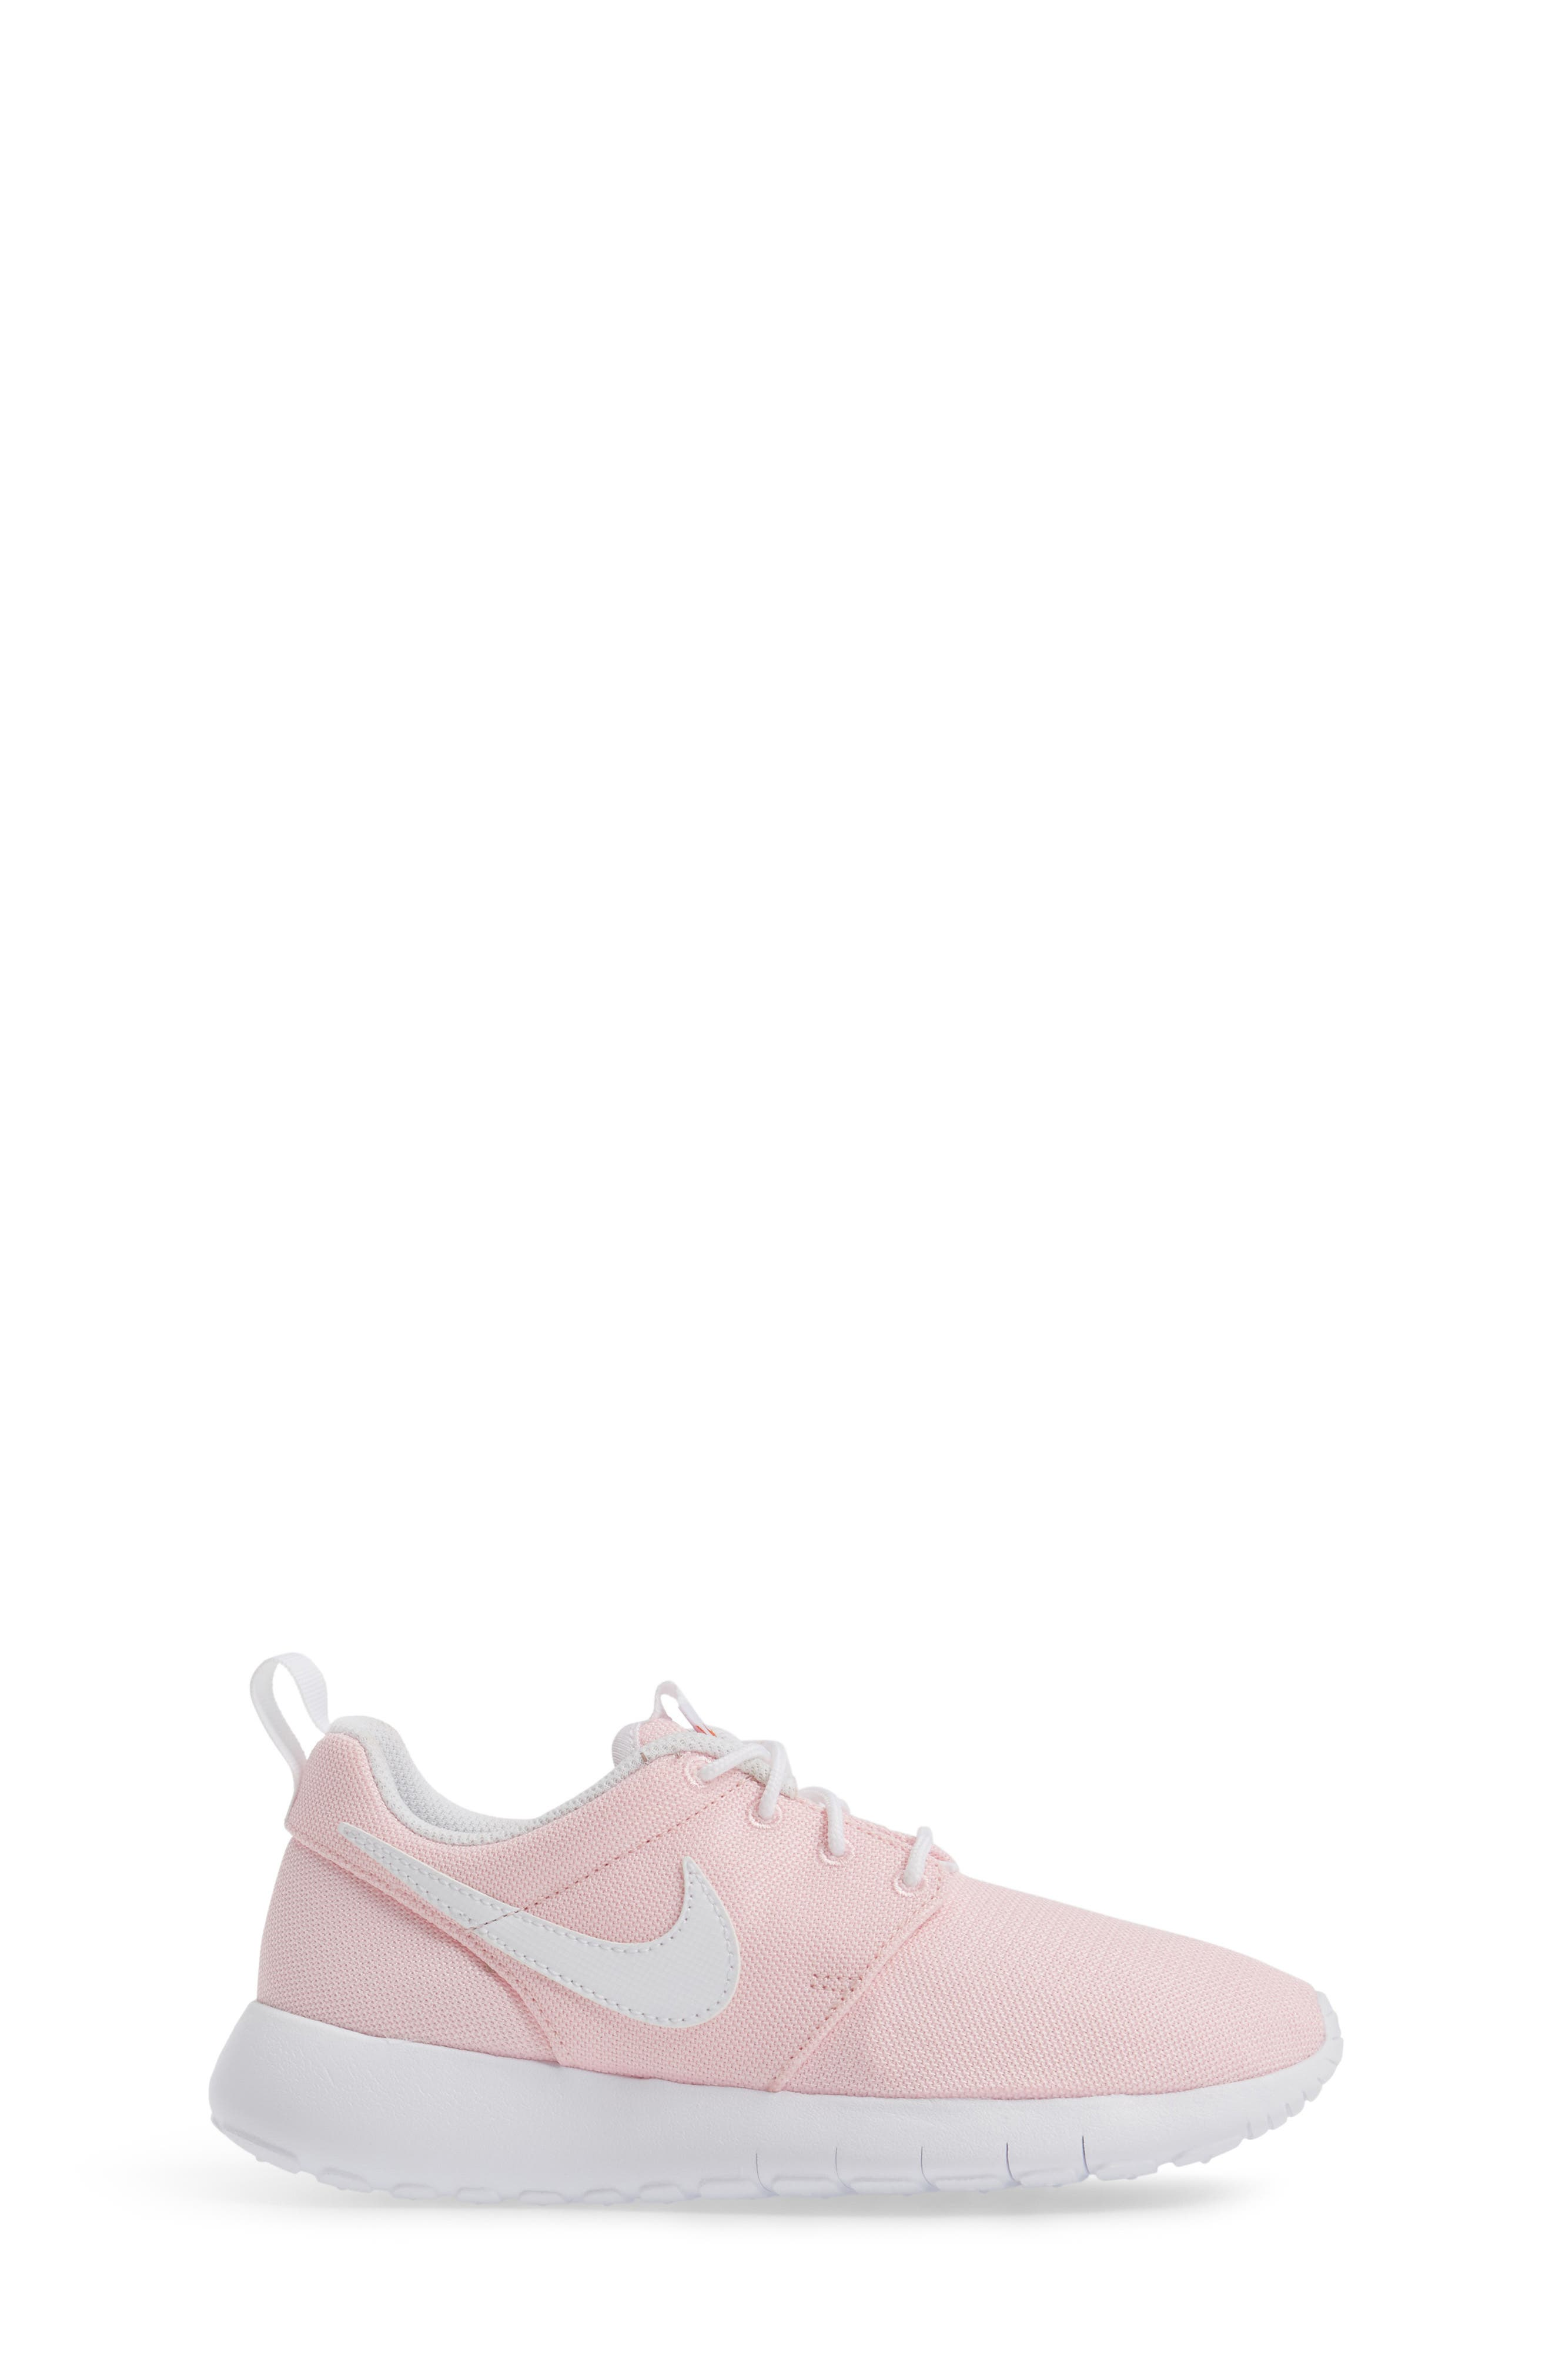 'Roshe Run' Athletic Shoe,                             Alternate thumbnail 143, color,